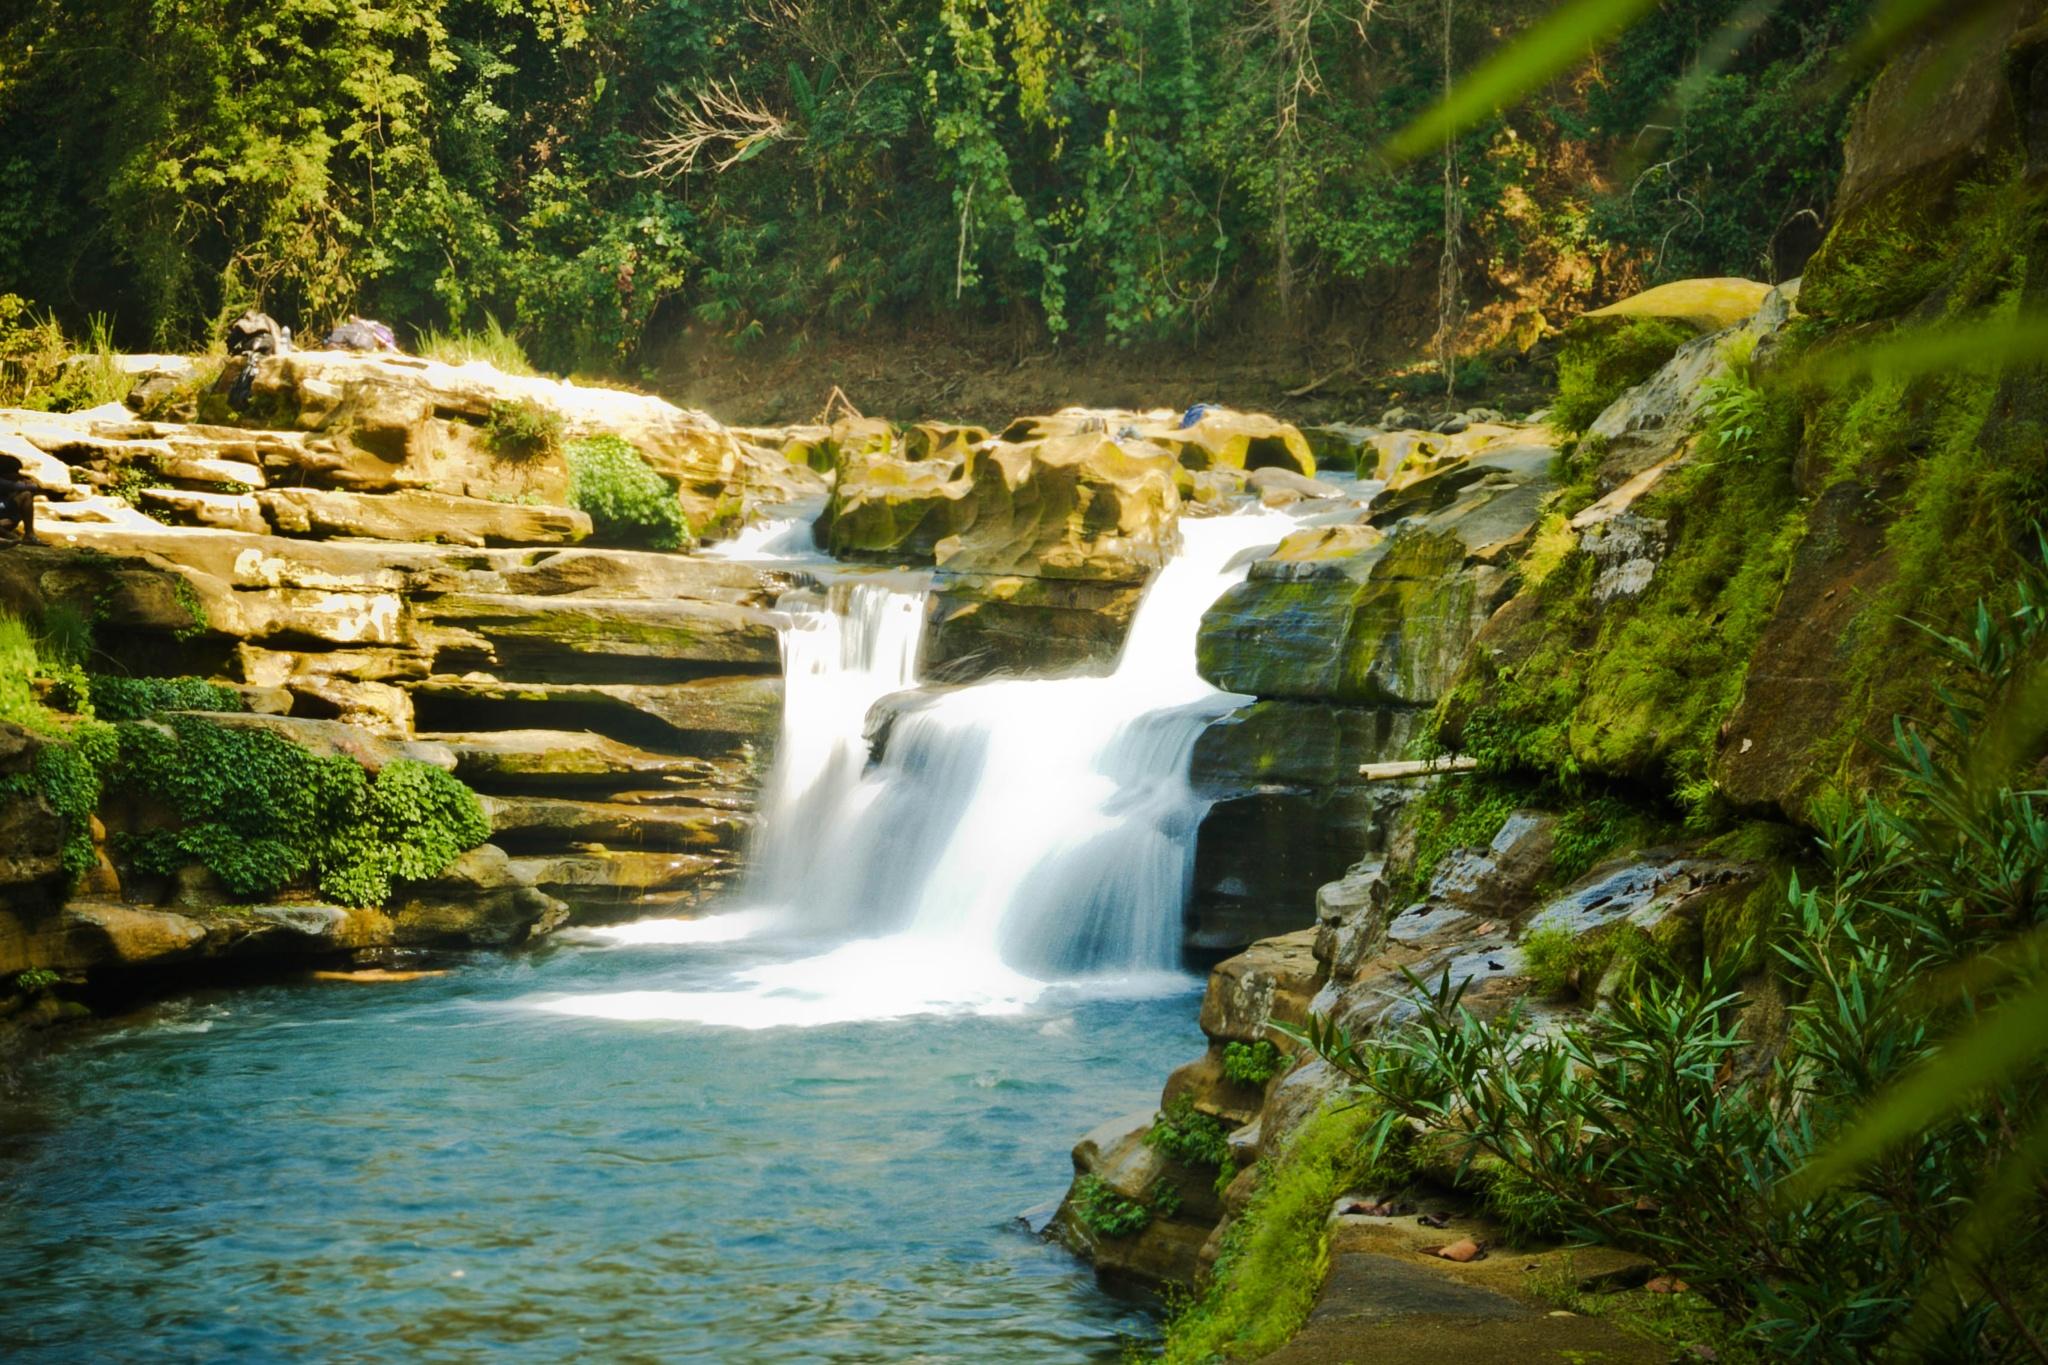 waterfall in Bangladesh by Mursadur Rahman Akash